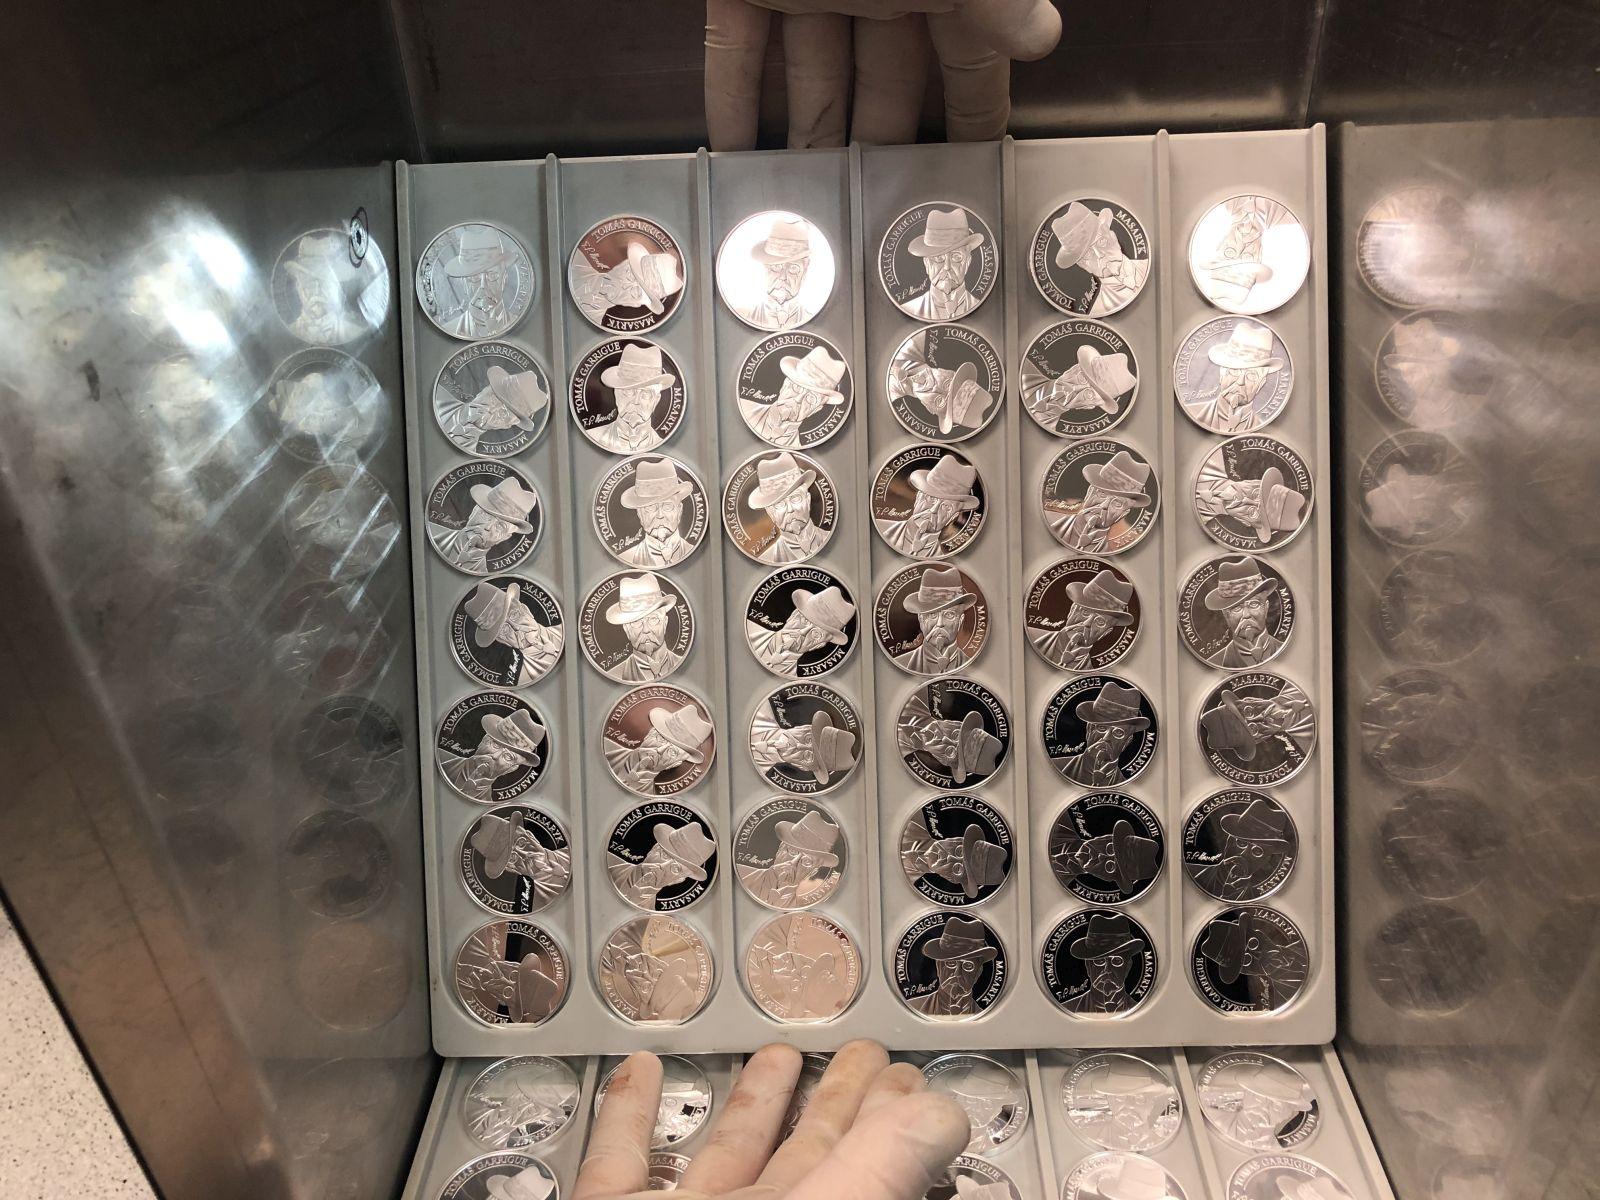 Ražba stříbrné medaile Tomáš Garrigue Masaryk